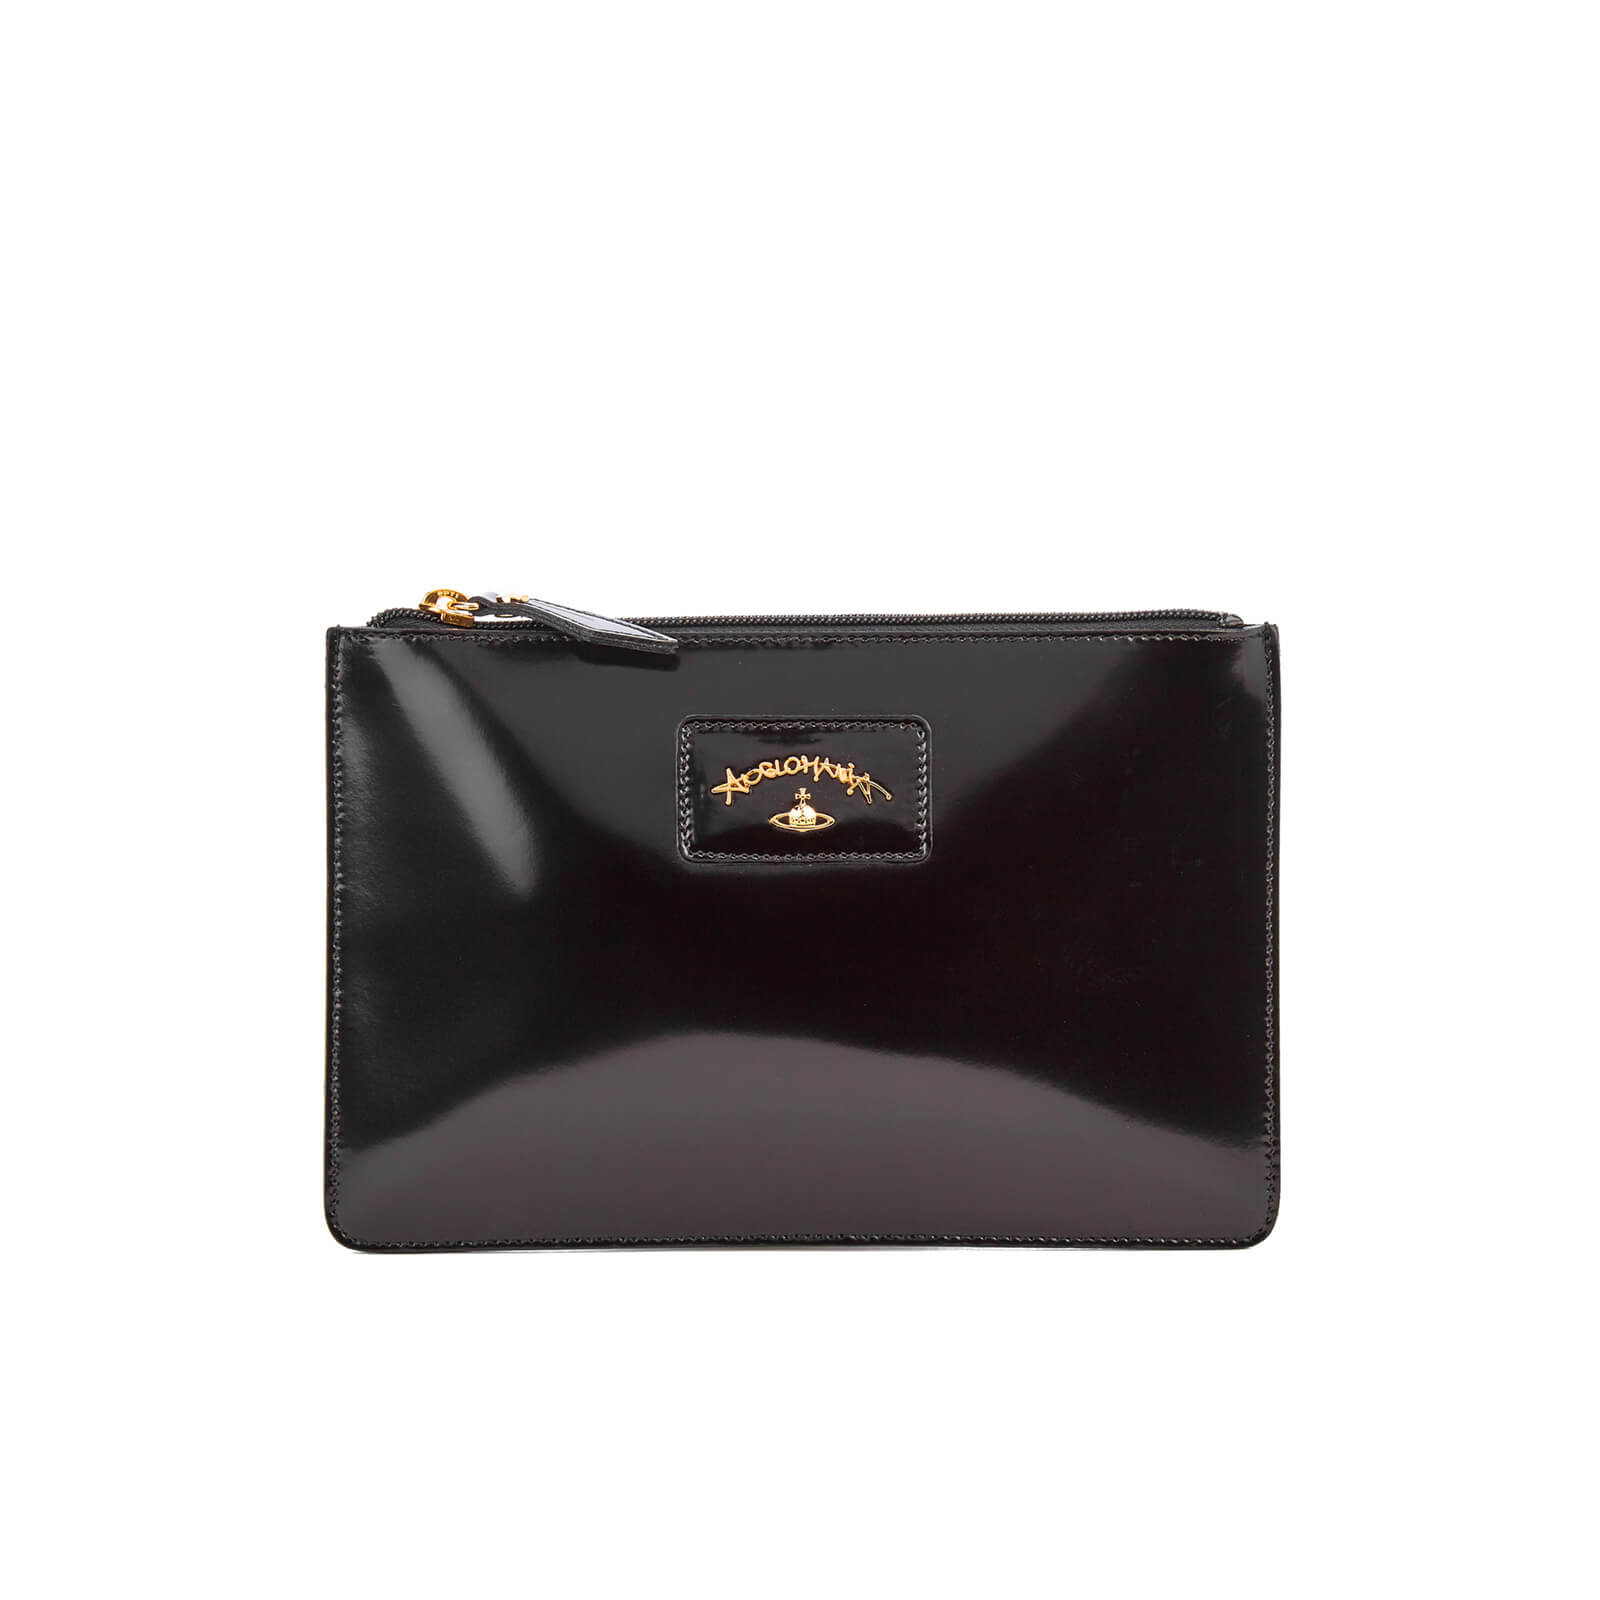 679b219772f5 Vivienne Westwood Women s Newcastle Clutch Bag - Black - Free UK ...